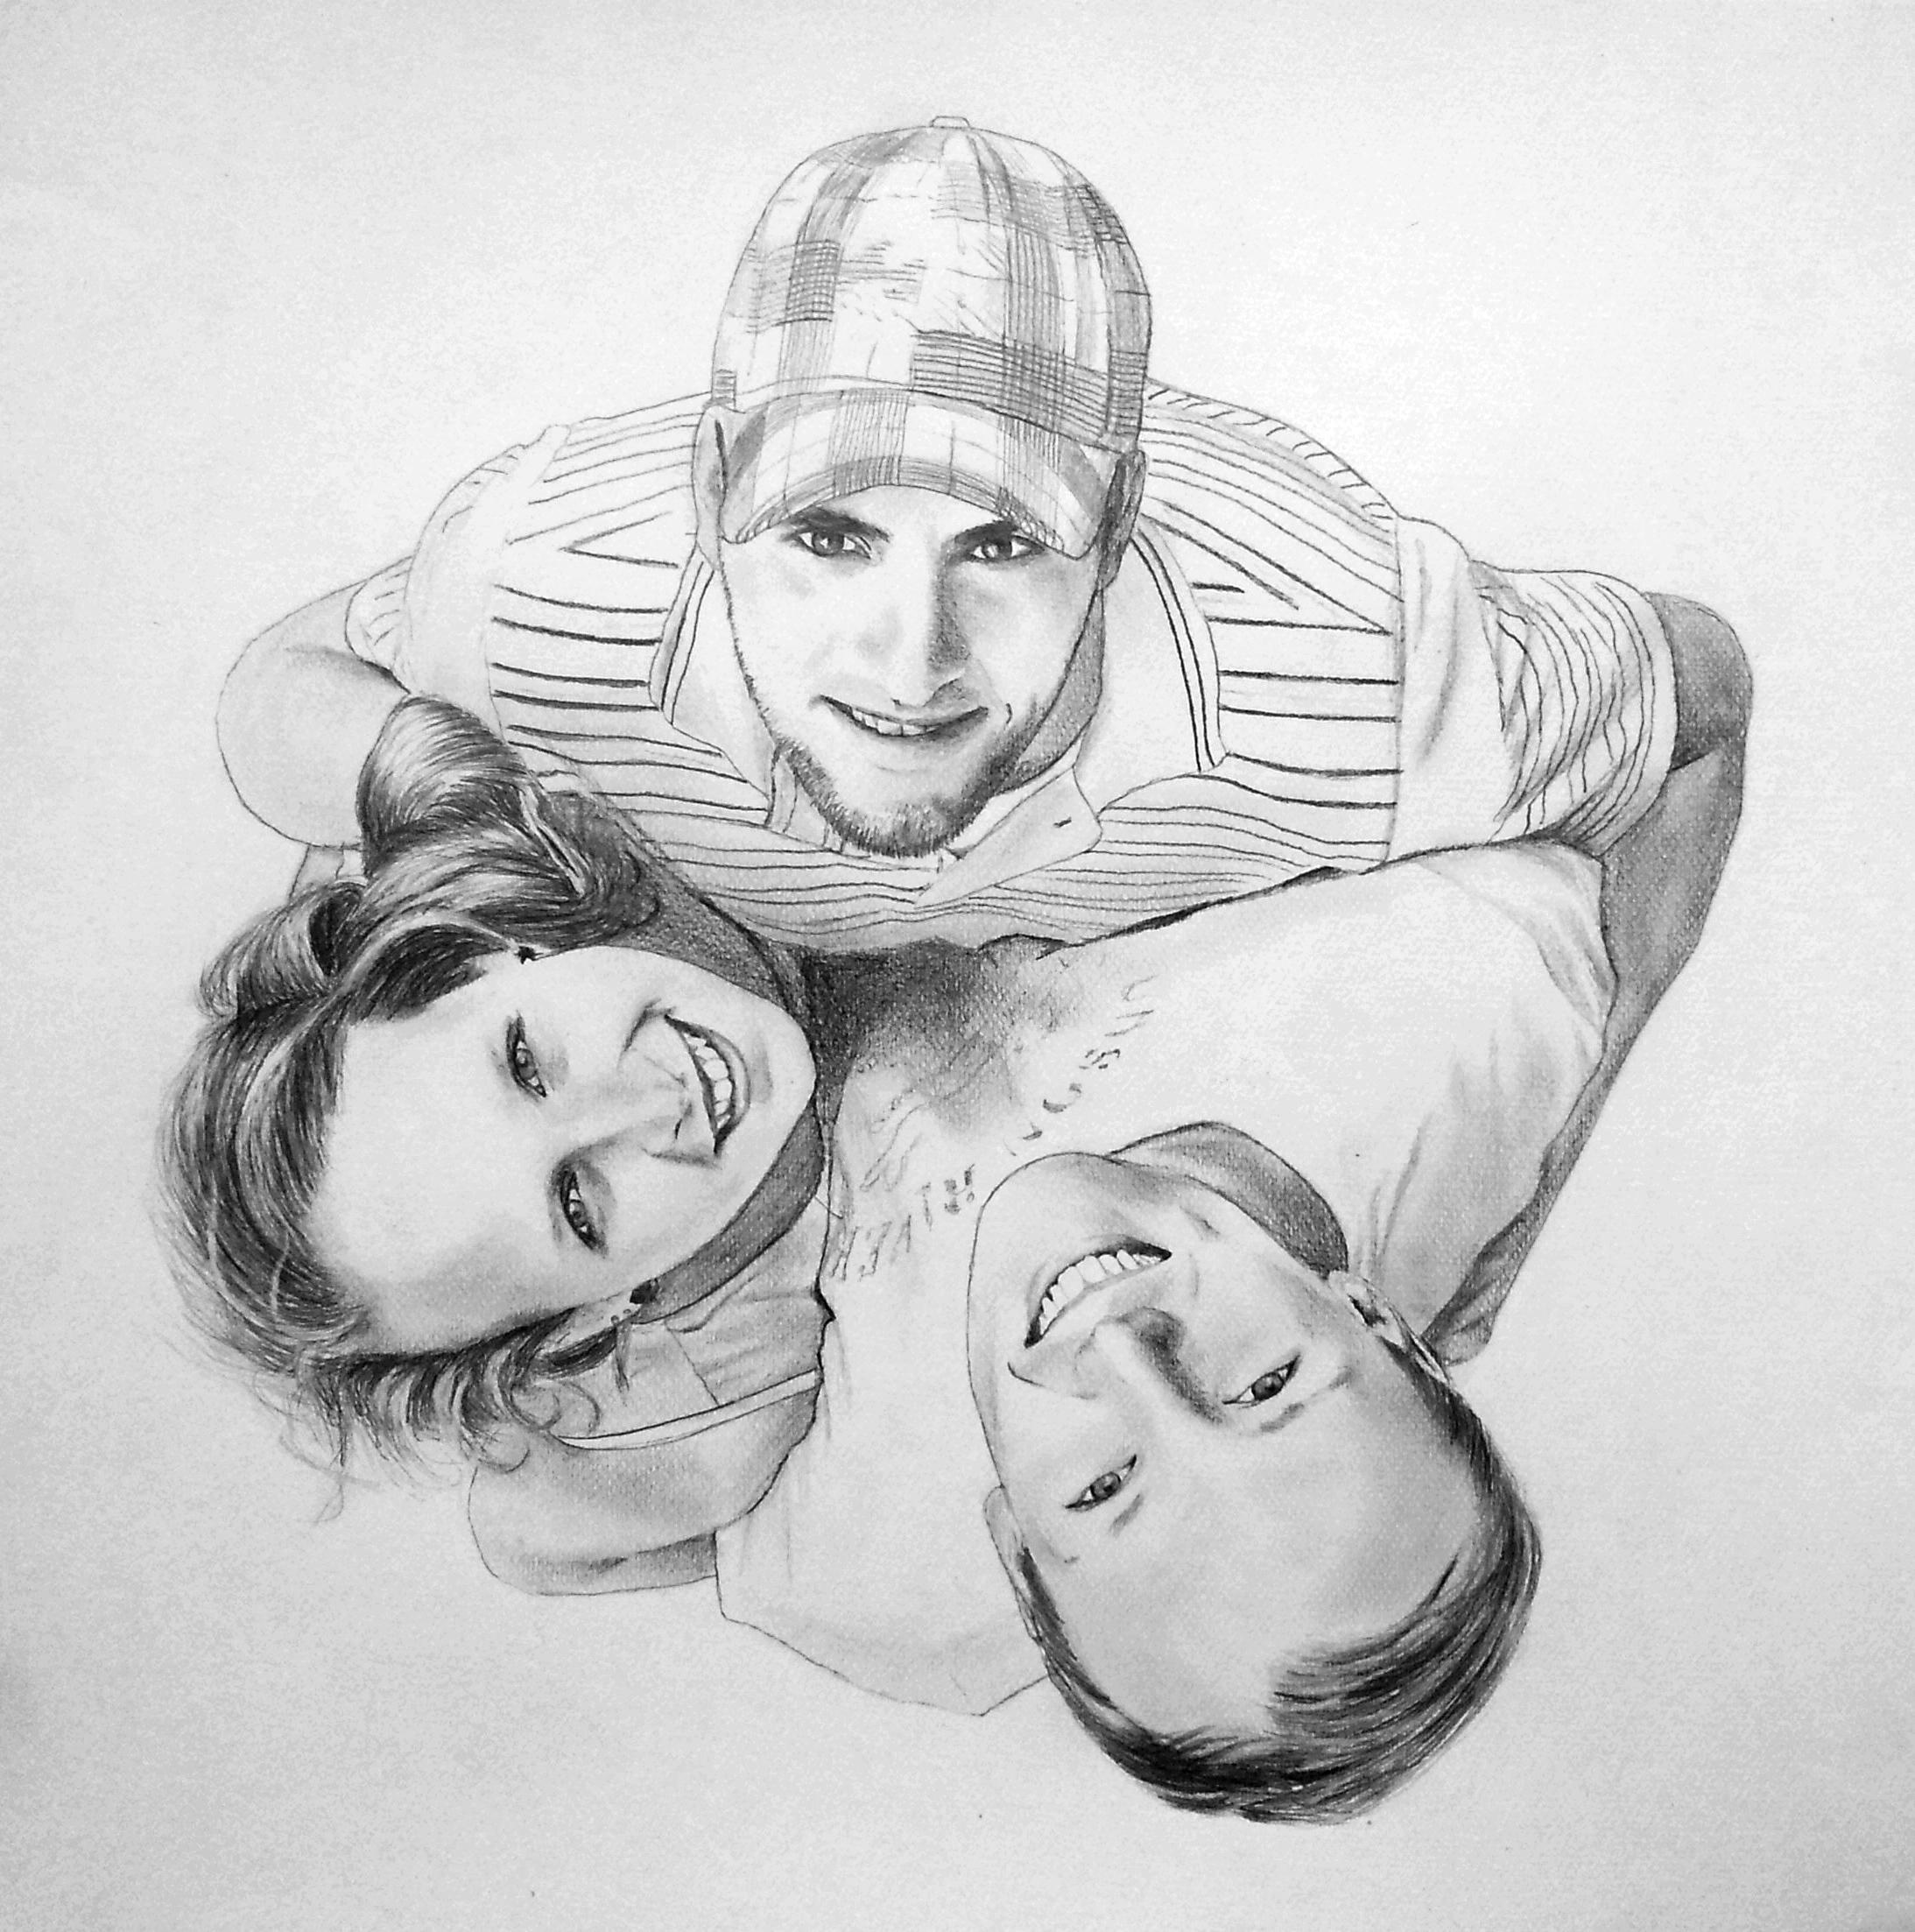 Doppelportrait | Gruppenportrait im Auftrag